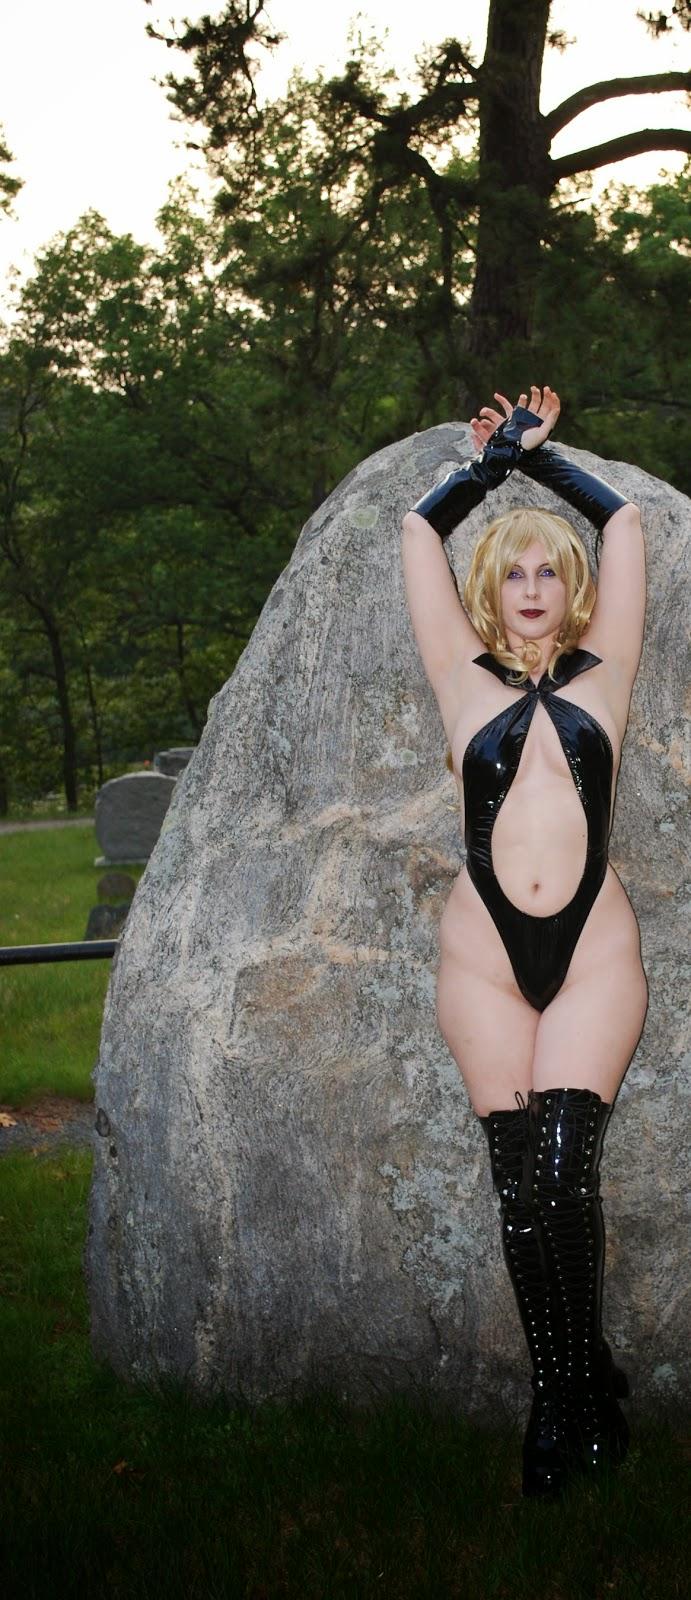 Draculina (Vampirella's blonde twin sister) - (Panda Valentine)